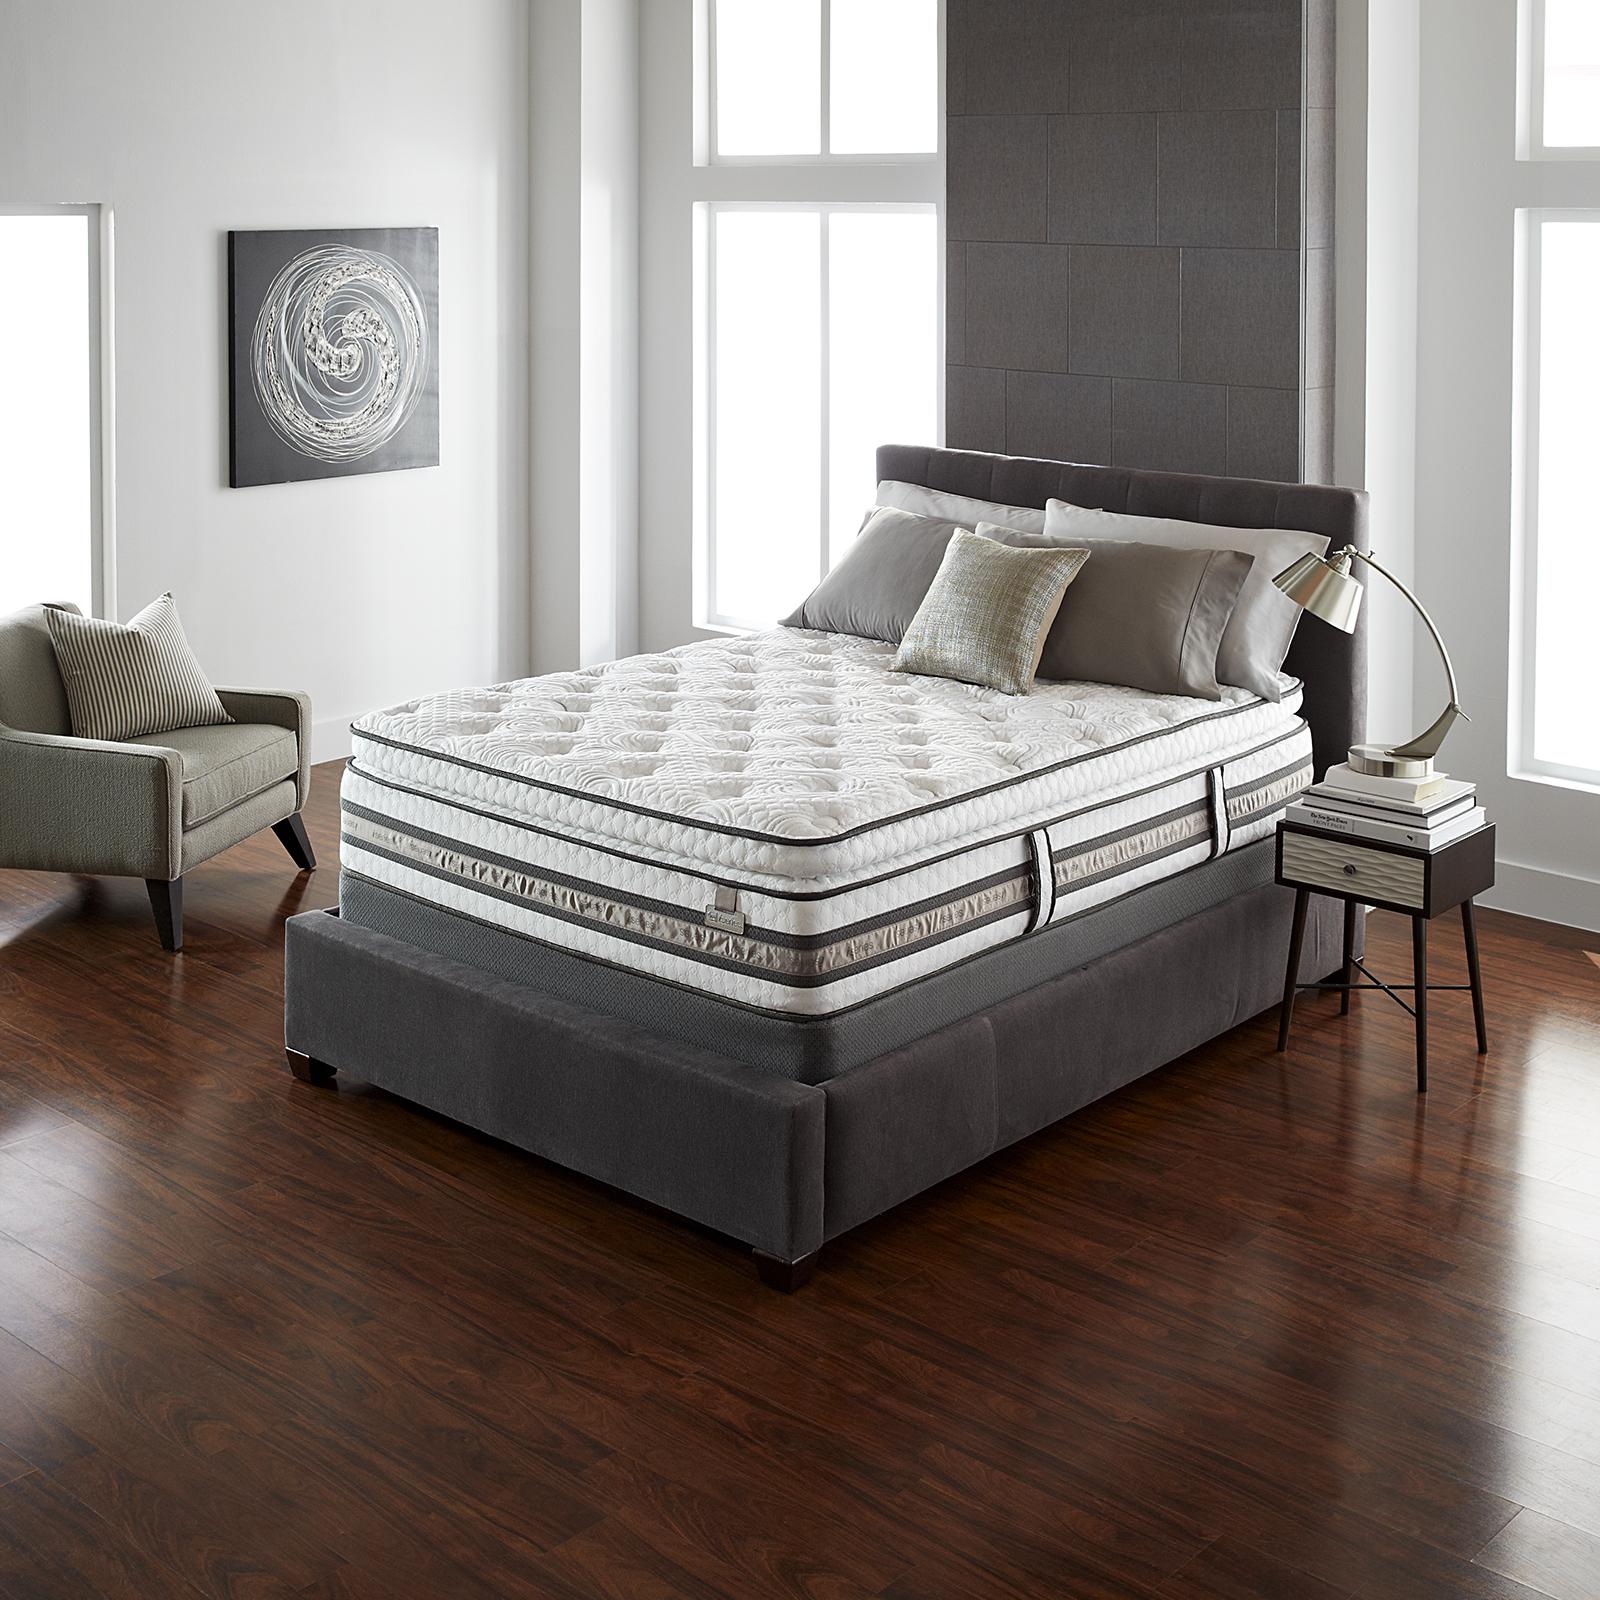 Serta iSeries iSeries Merit Super Pillow Top II California King Mattress Only